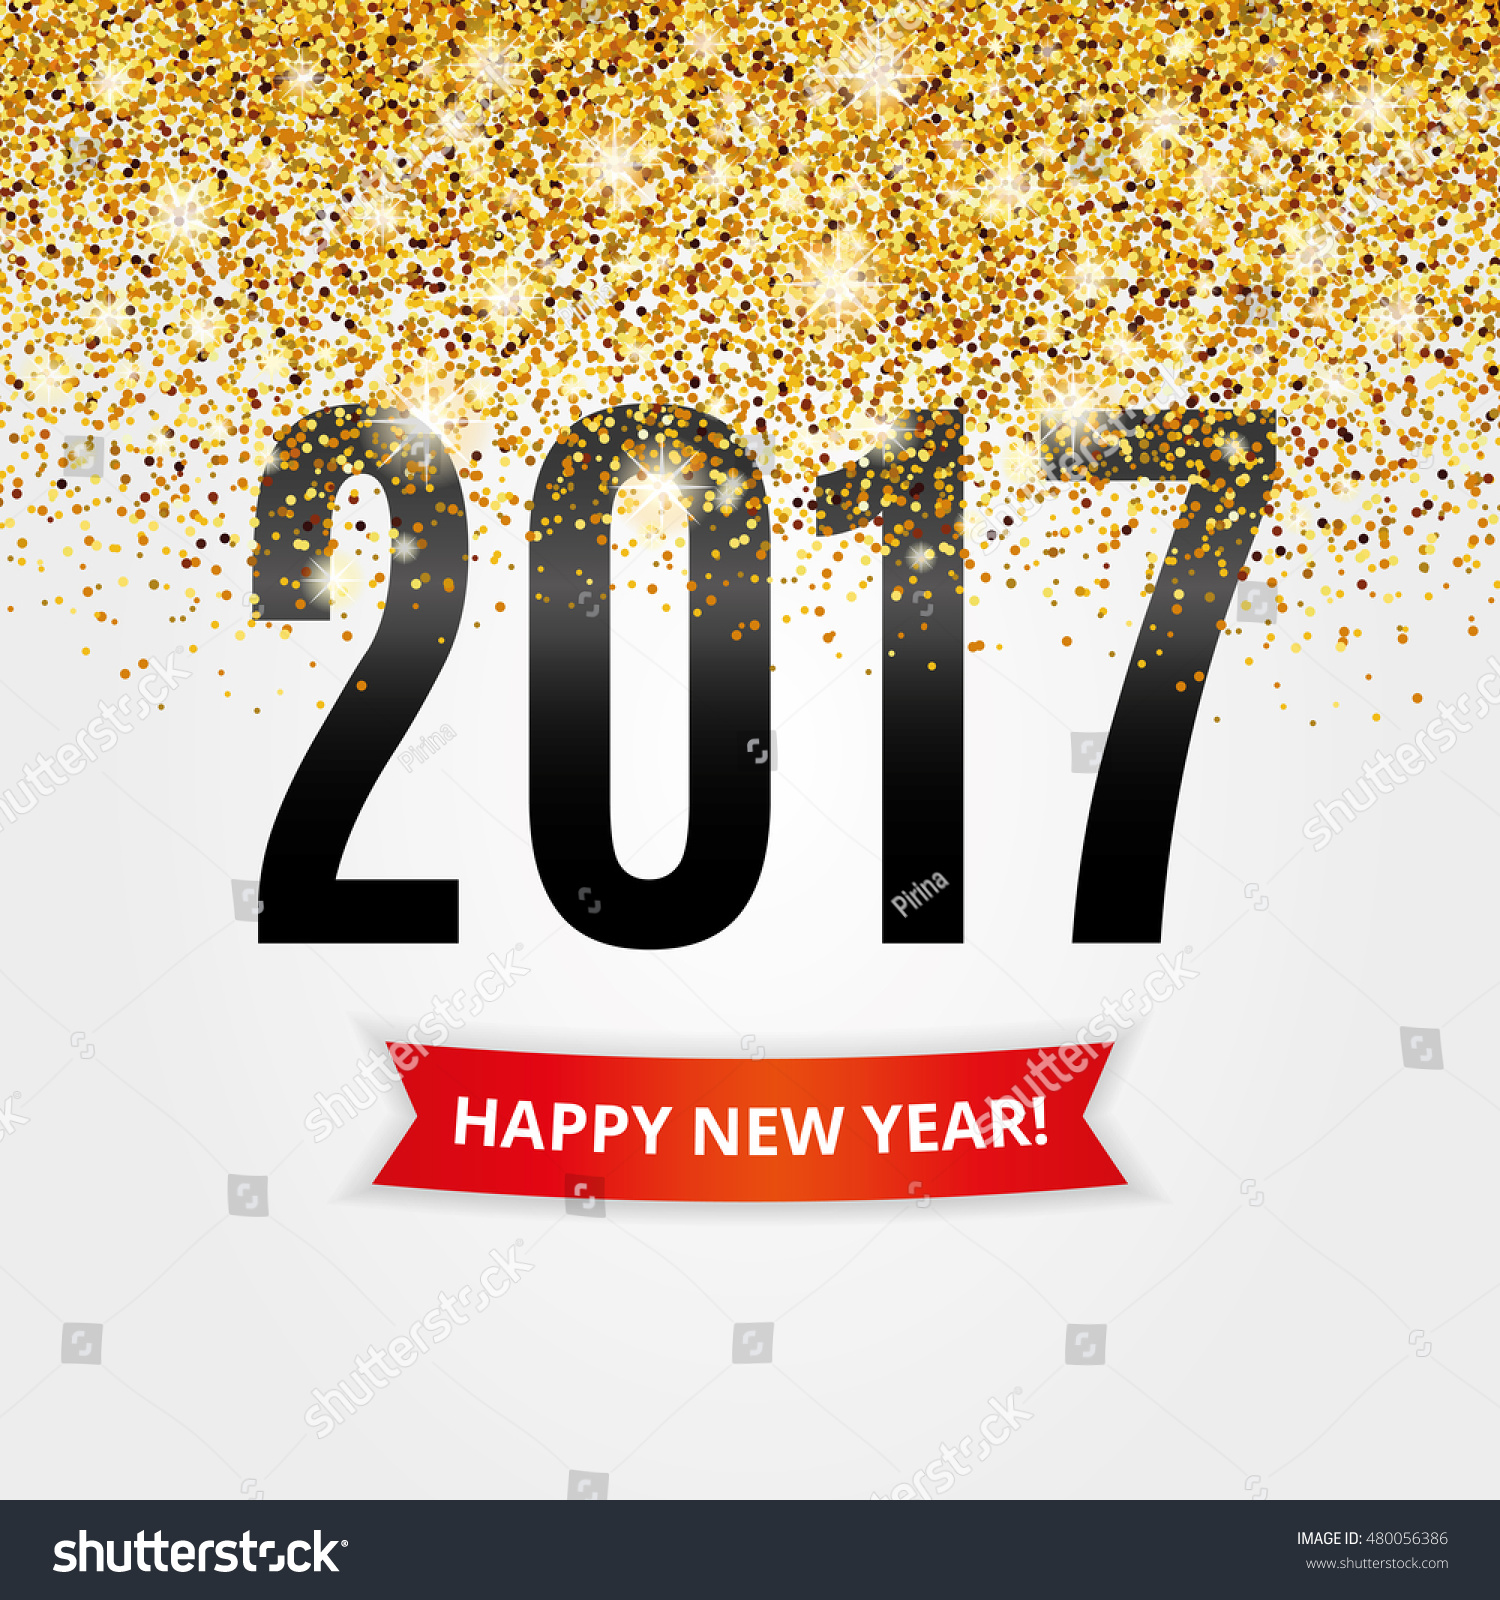 Happy New Year Gold Glitter New Stock Vector 480056386 - Shutterstock